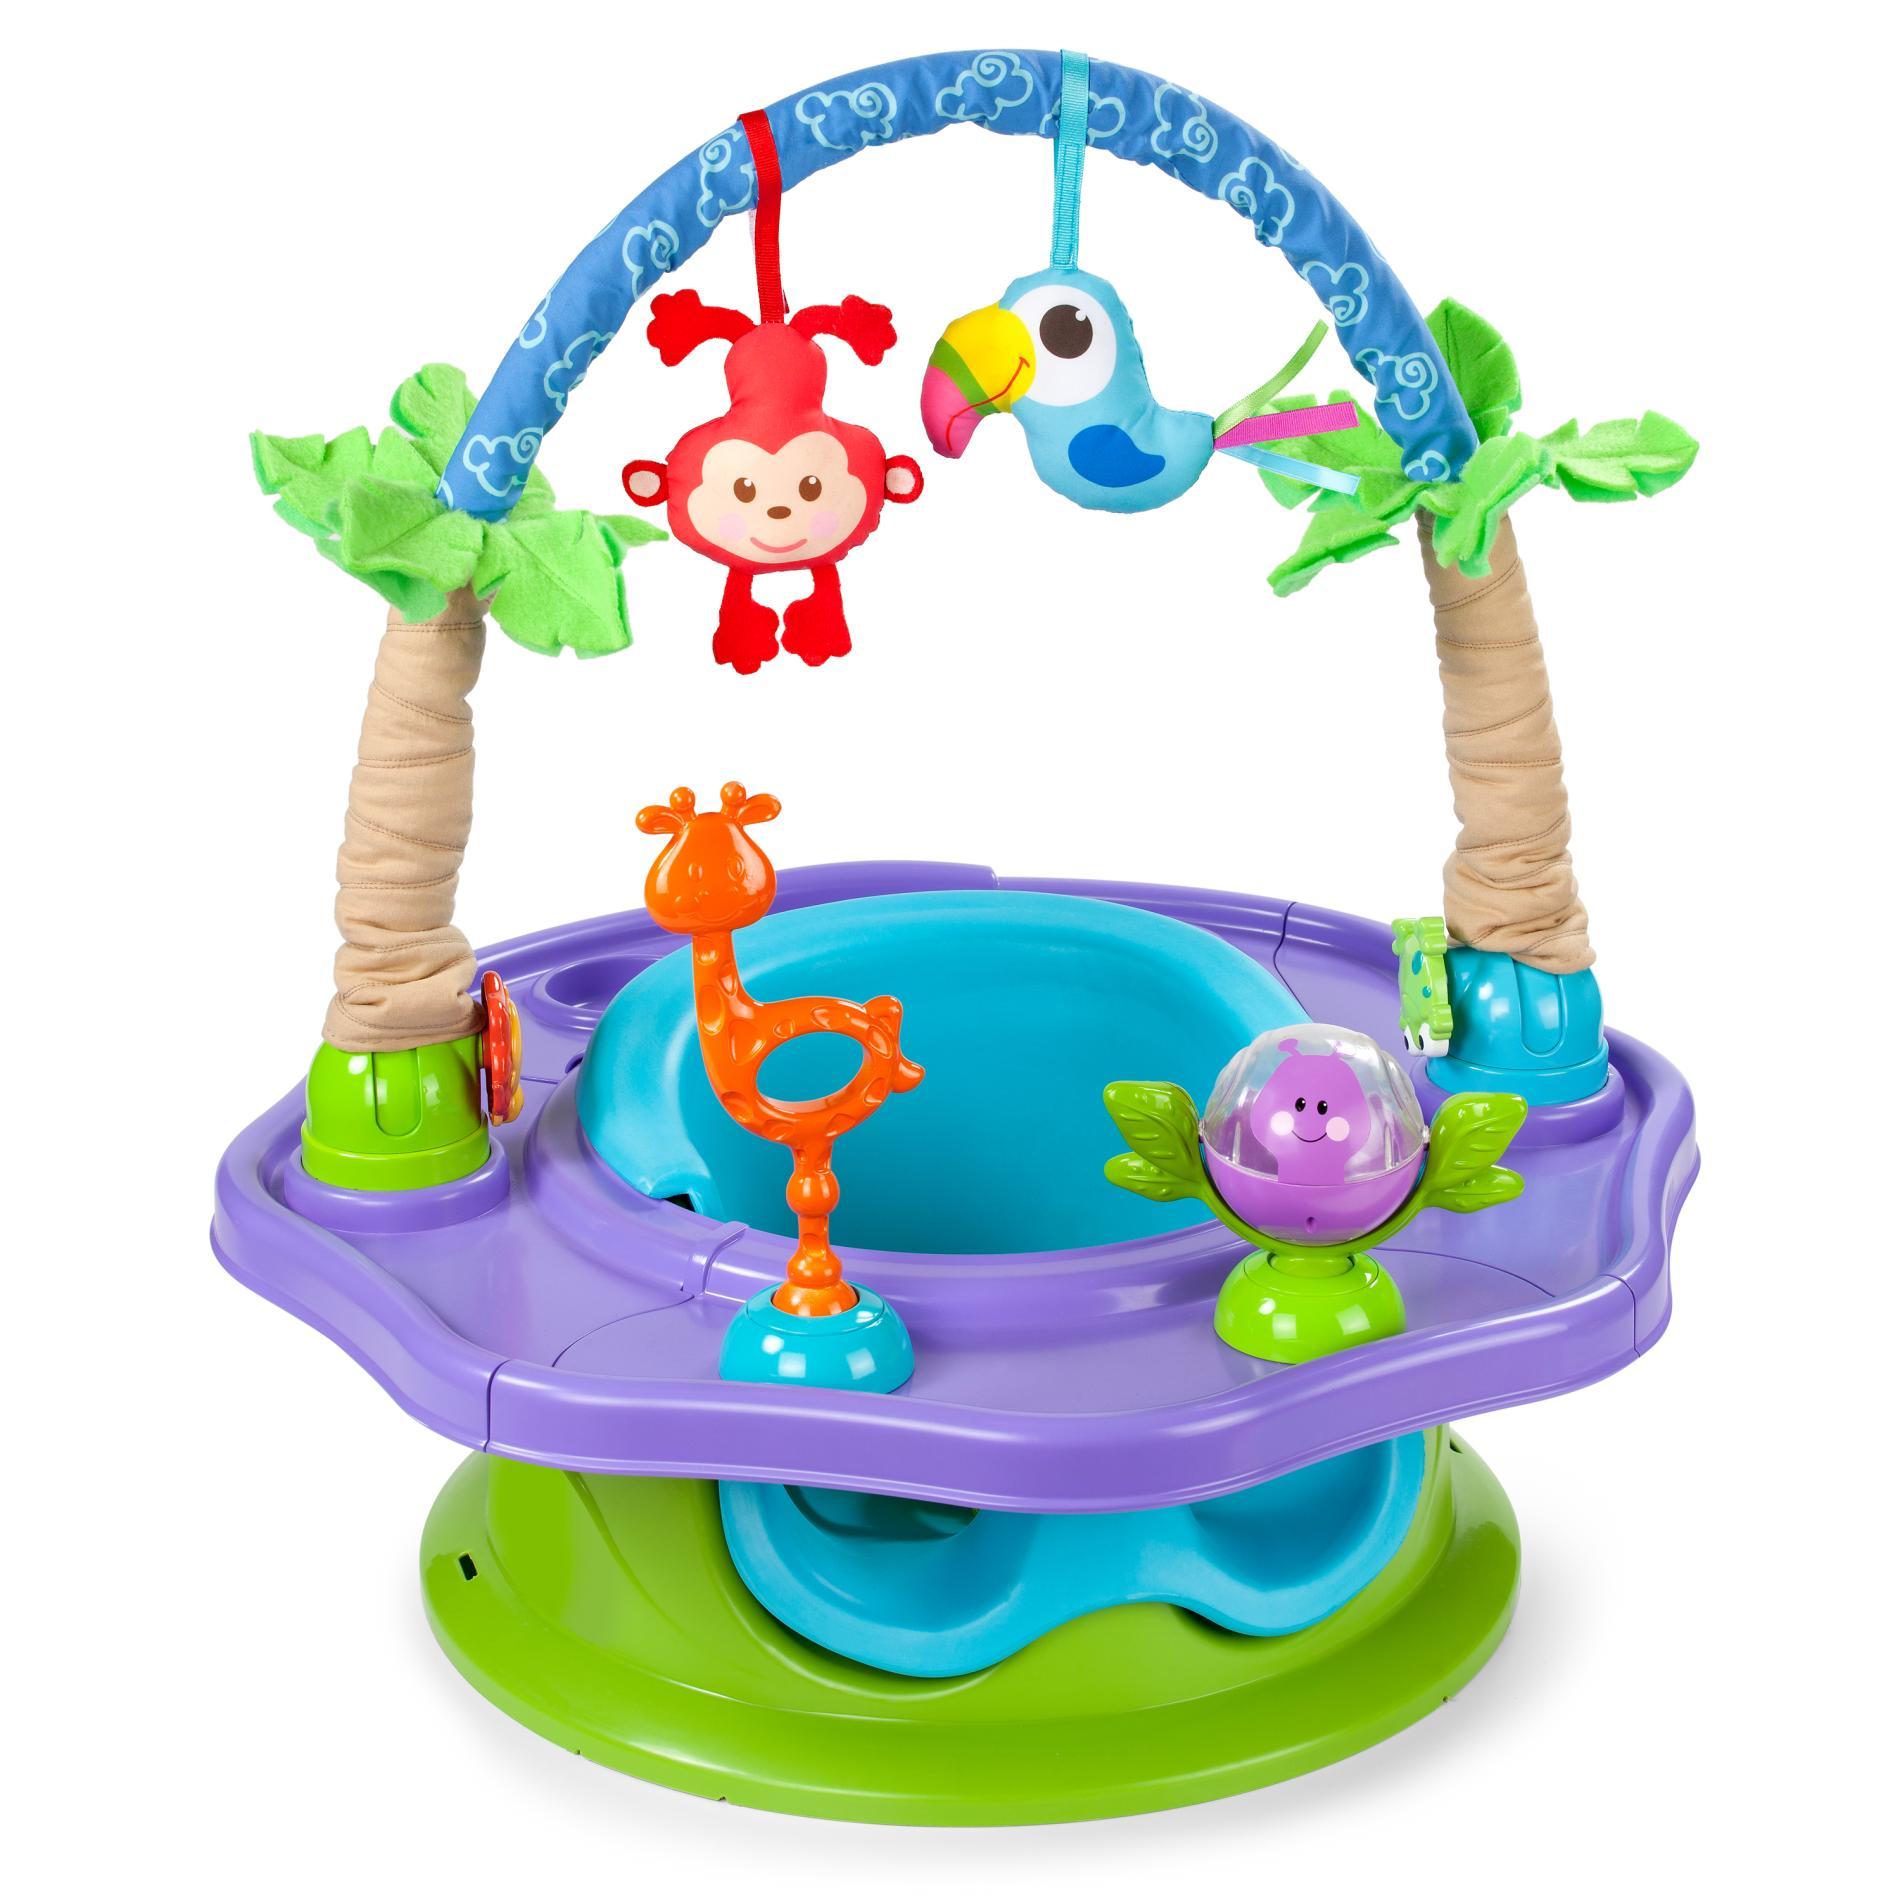 Summer Infant Island Giggles Super Booster Seat